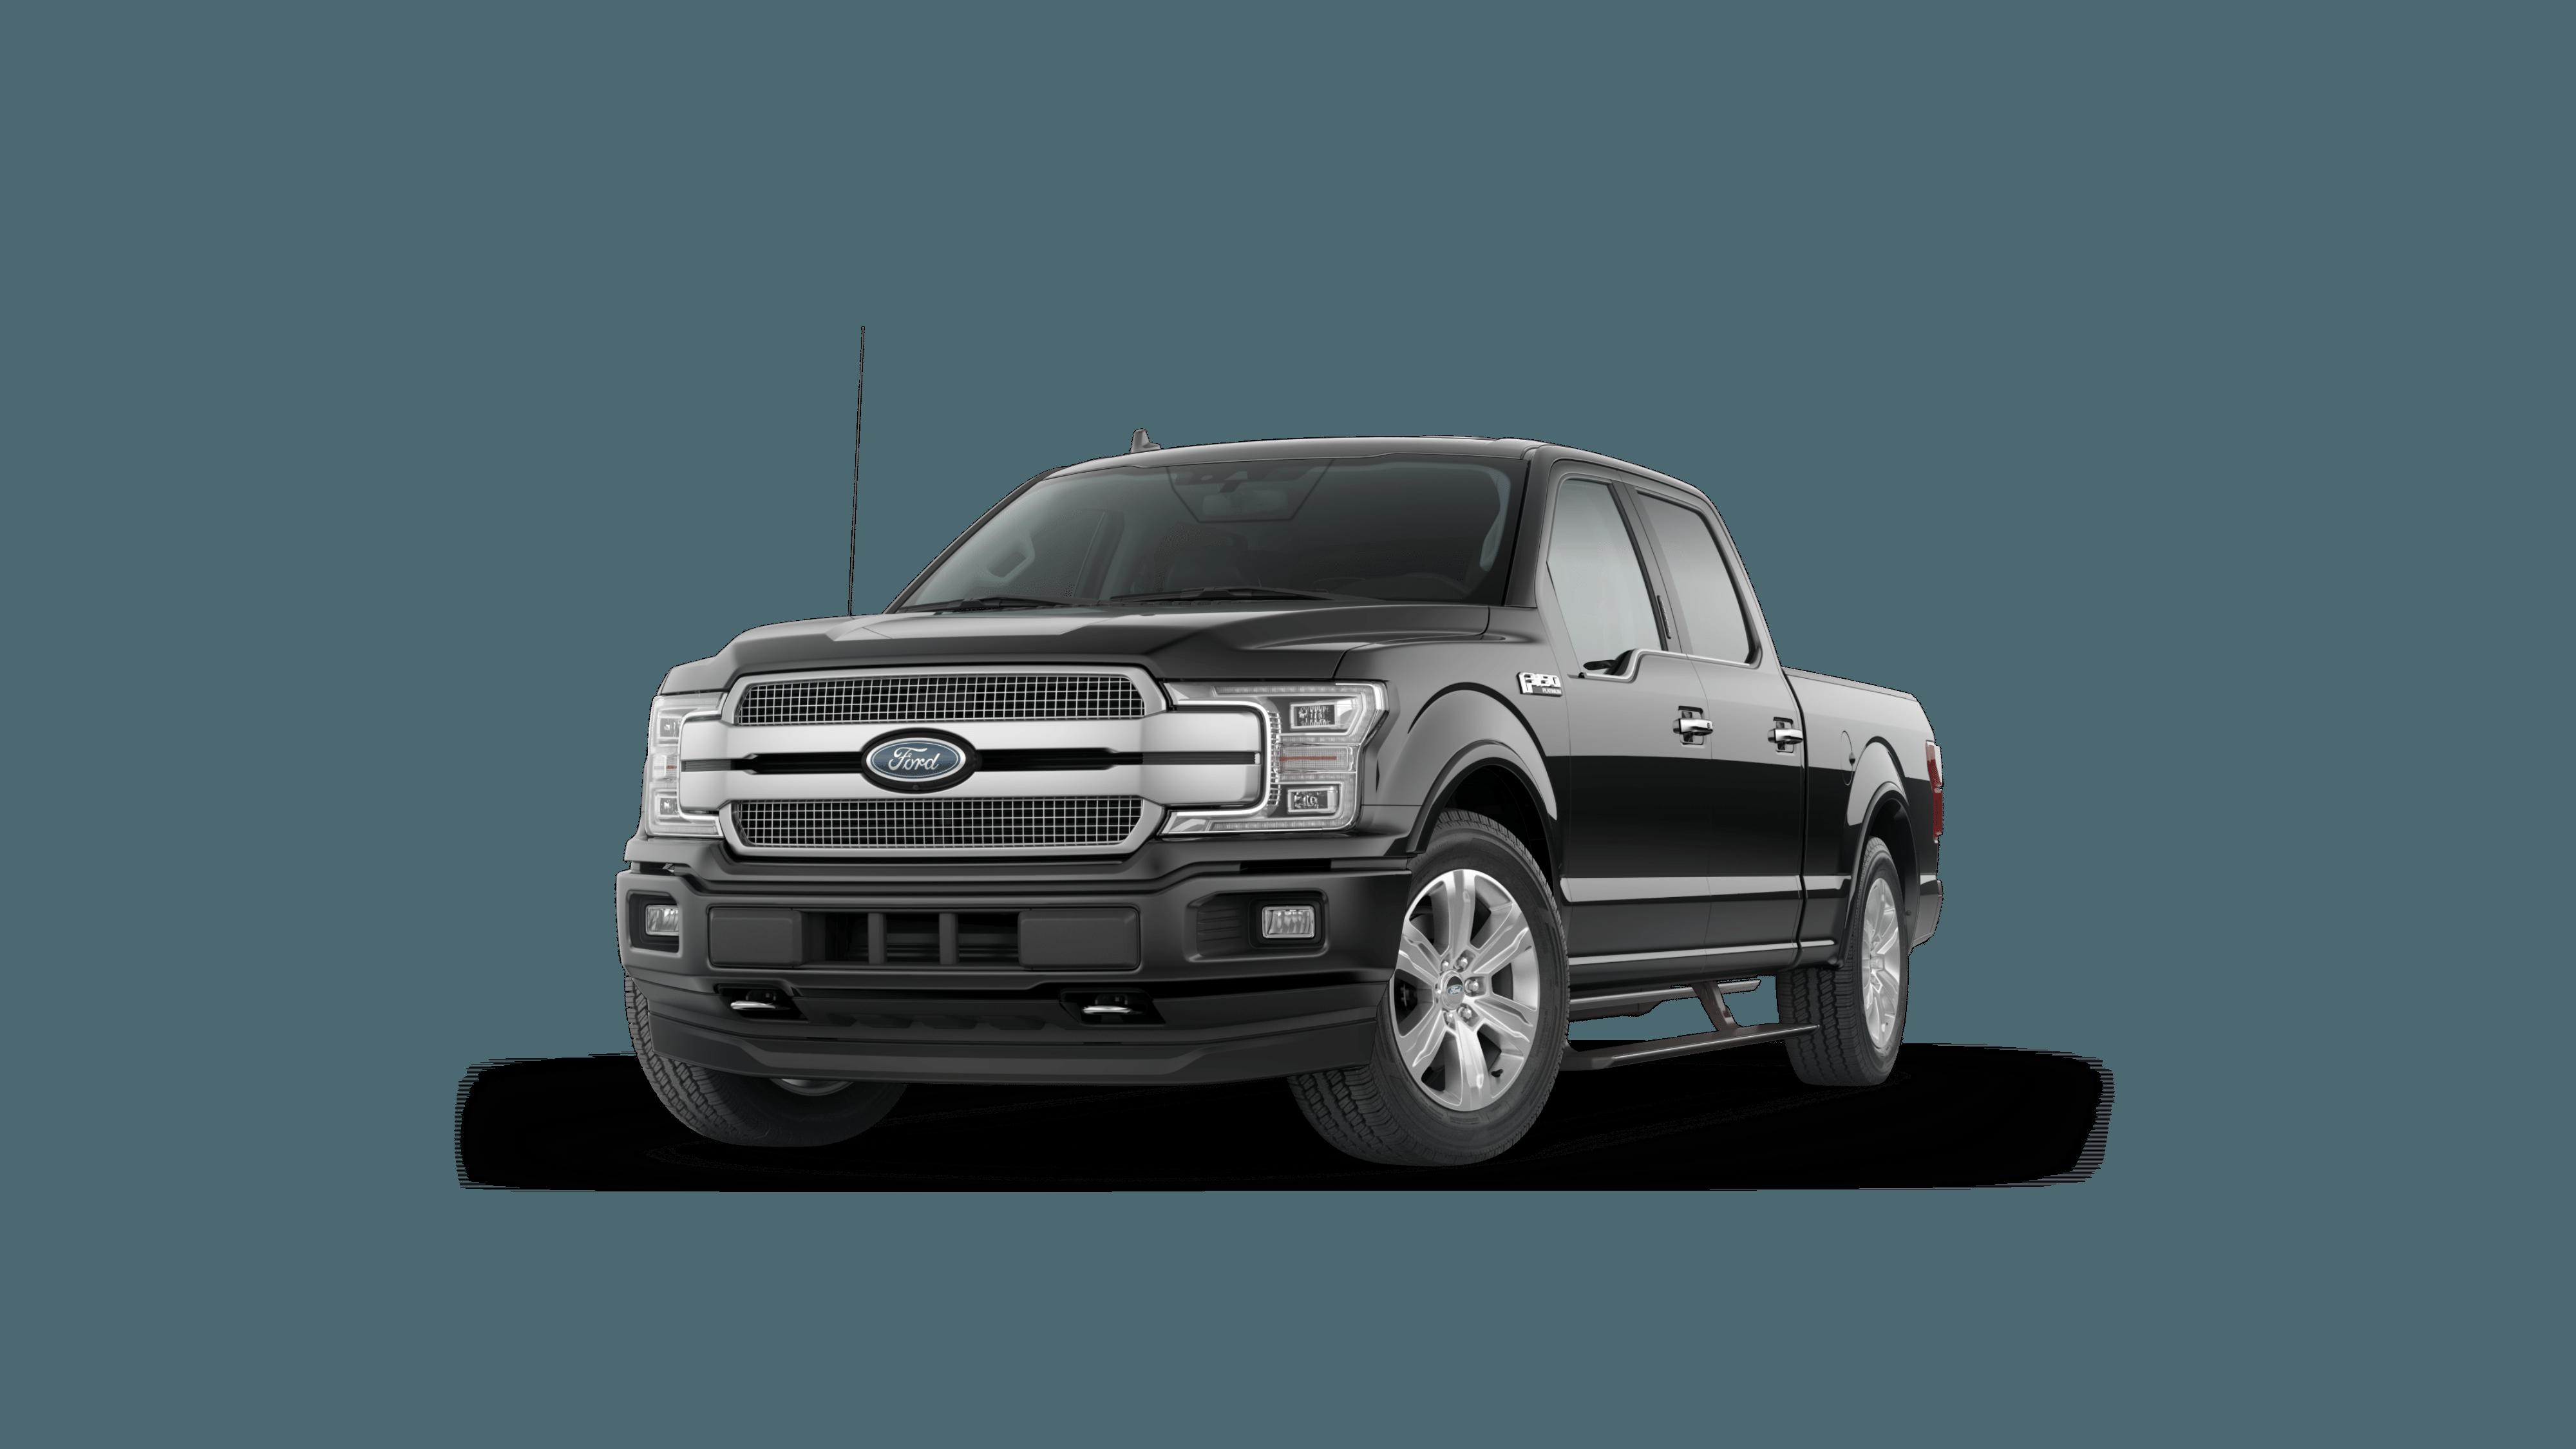 Ciocca Ford Quakertown >> New 2019 Ford F-150 Platinum 4WD SuperCrew 6.5' Box For Sale in Quakertown, PA   KFA04919